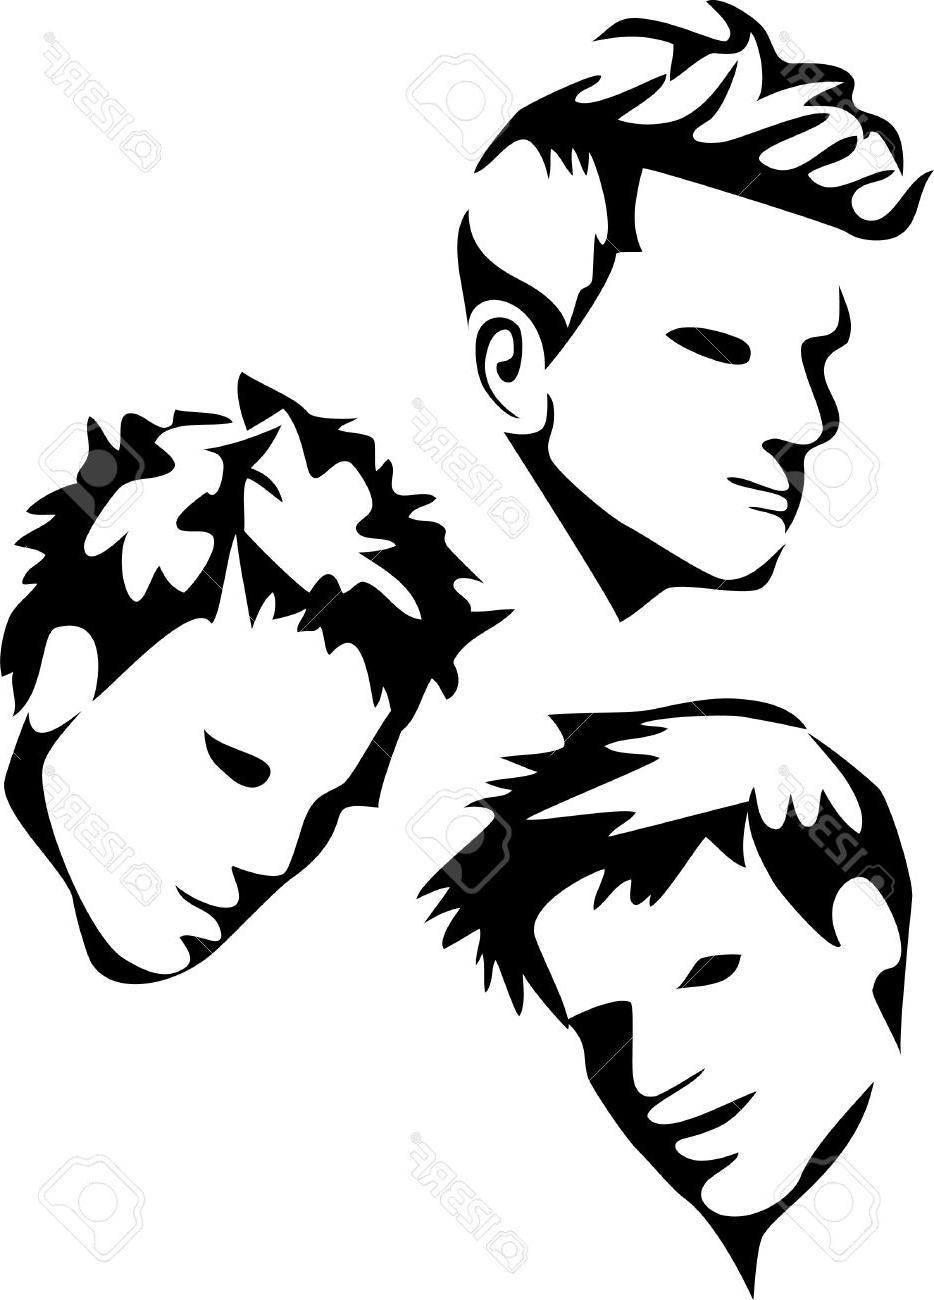 Haircut clipart mens haircut, Haircut mens haircut.